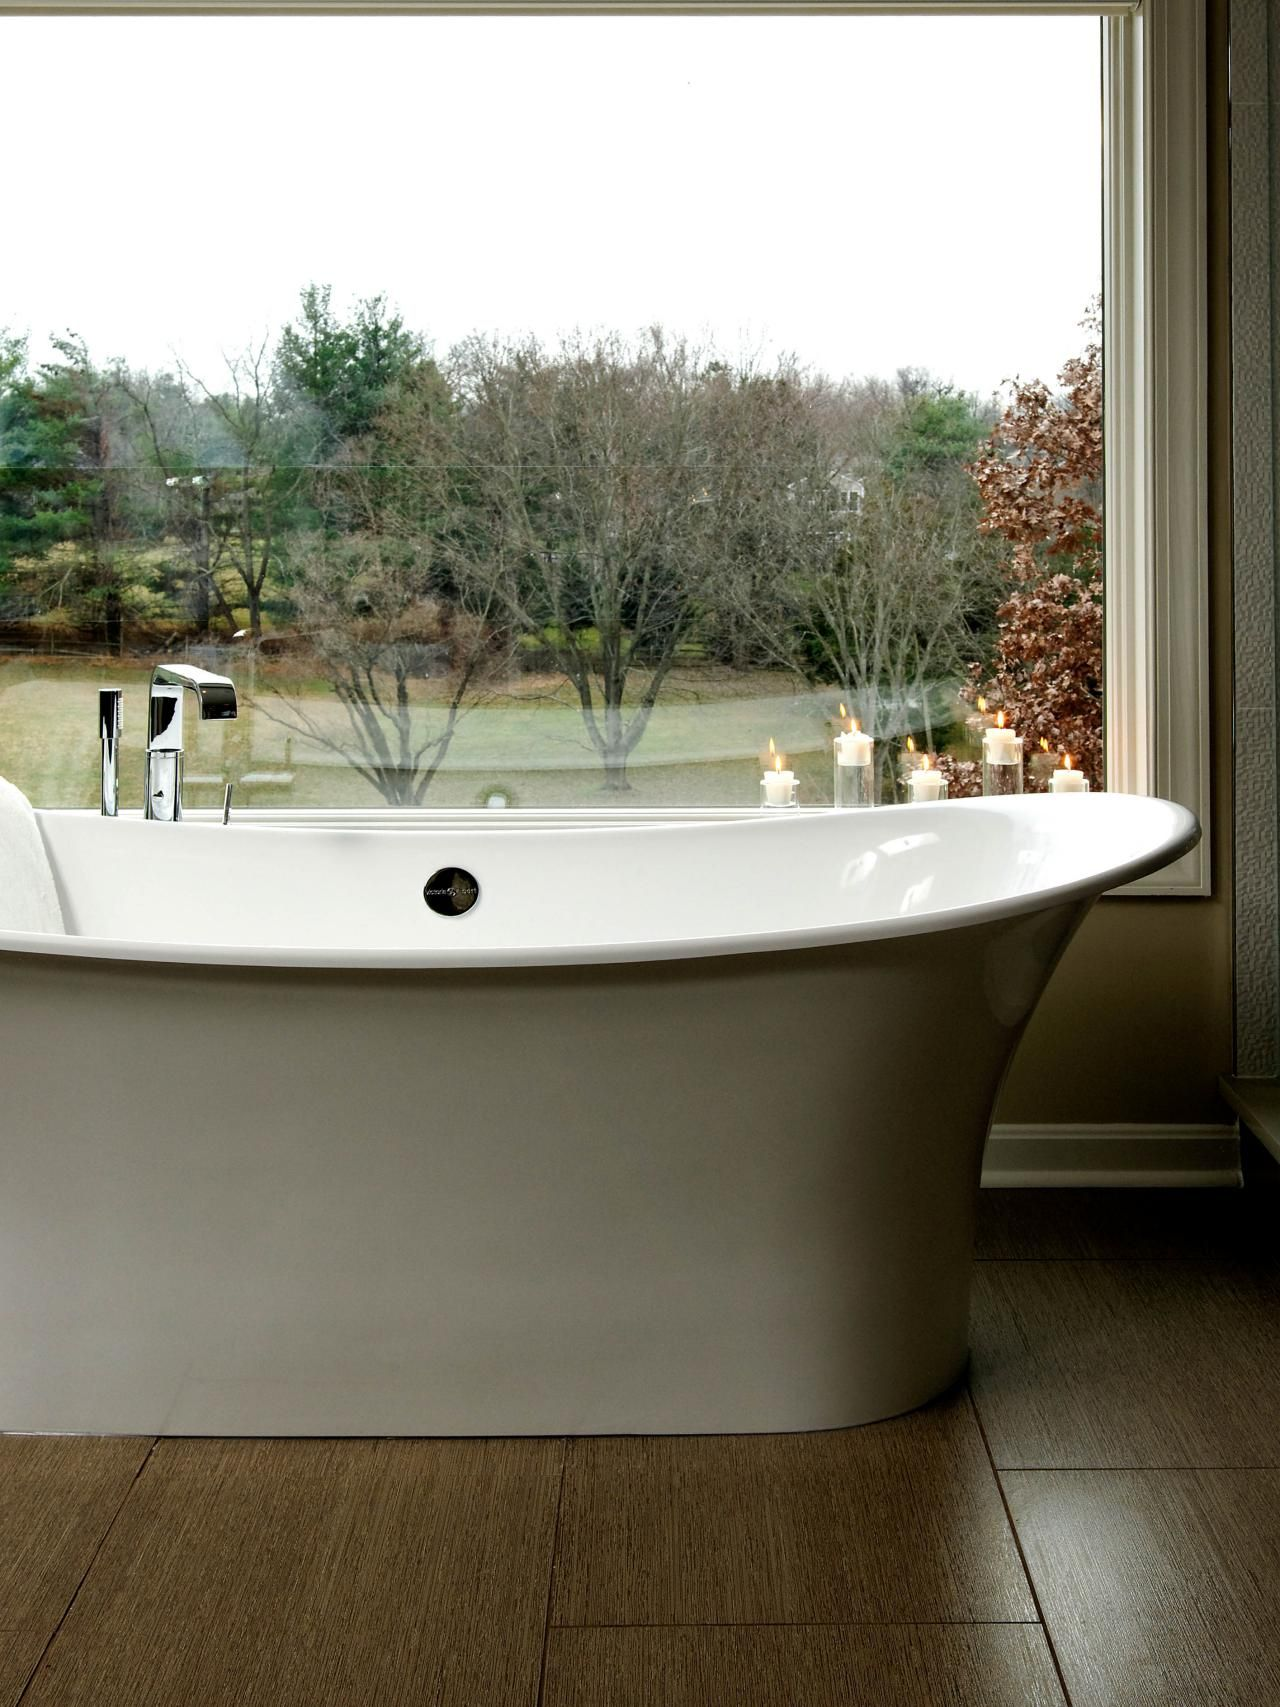 Simple Hot Chocolate, Three Ways | Pinterest | Freestanding tub ...